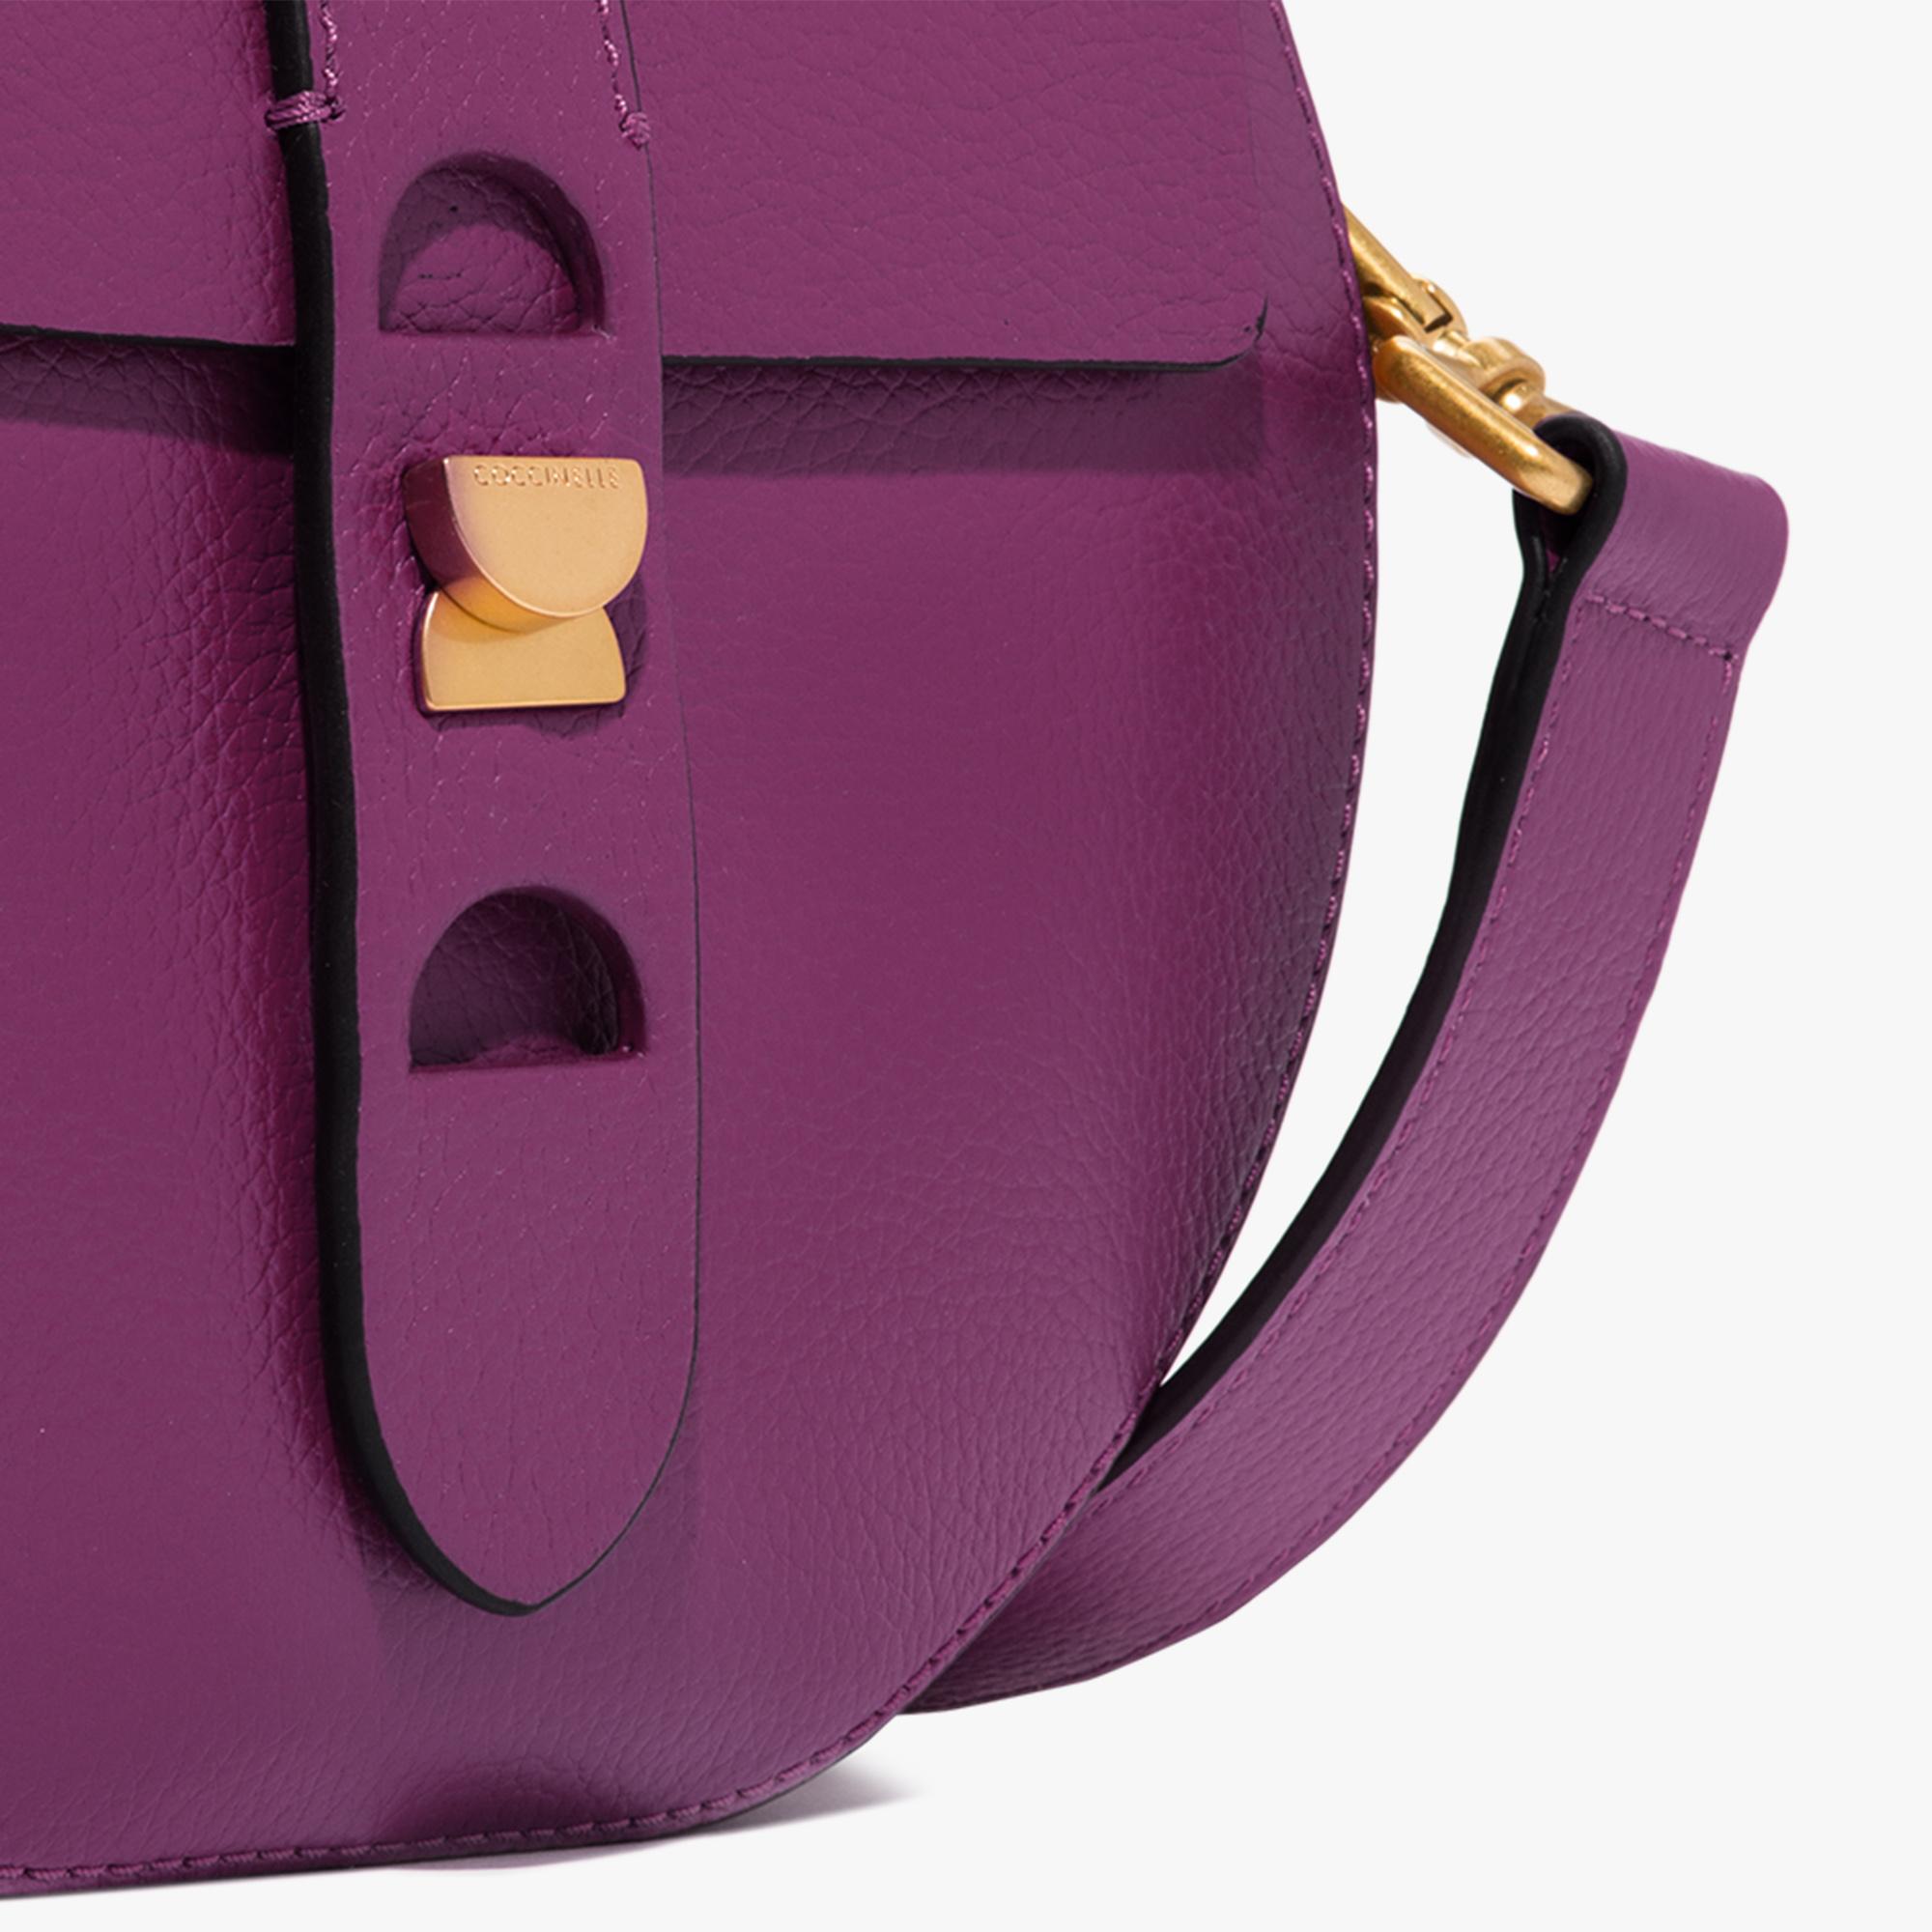 Coccinelle Carousel leather mini bag